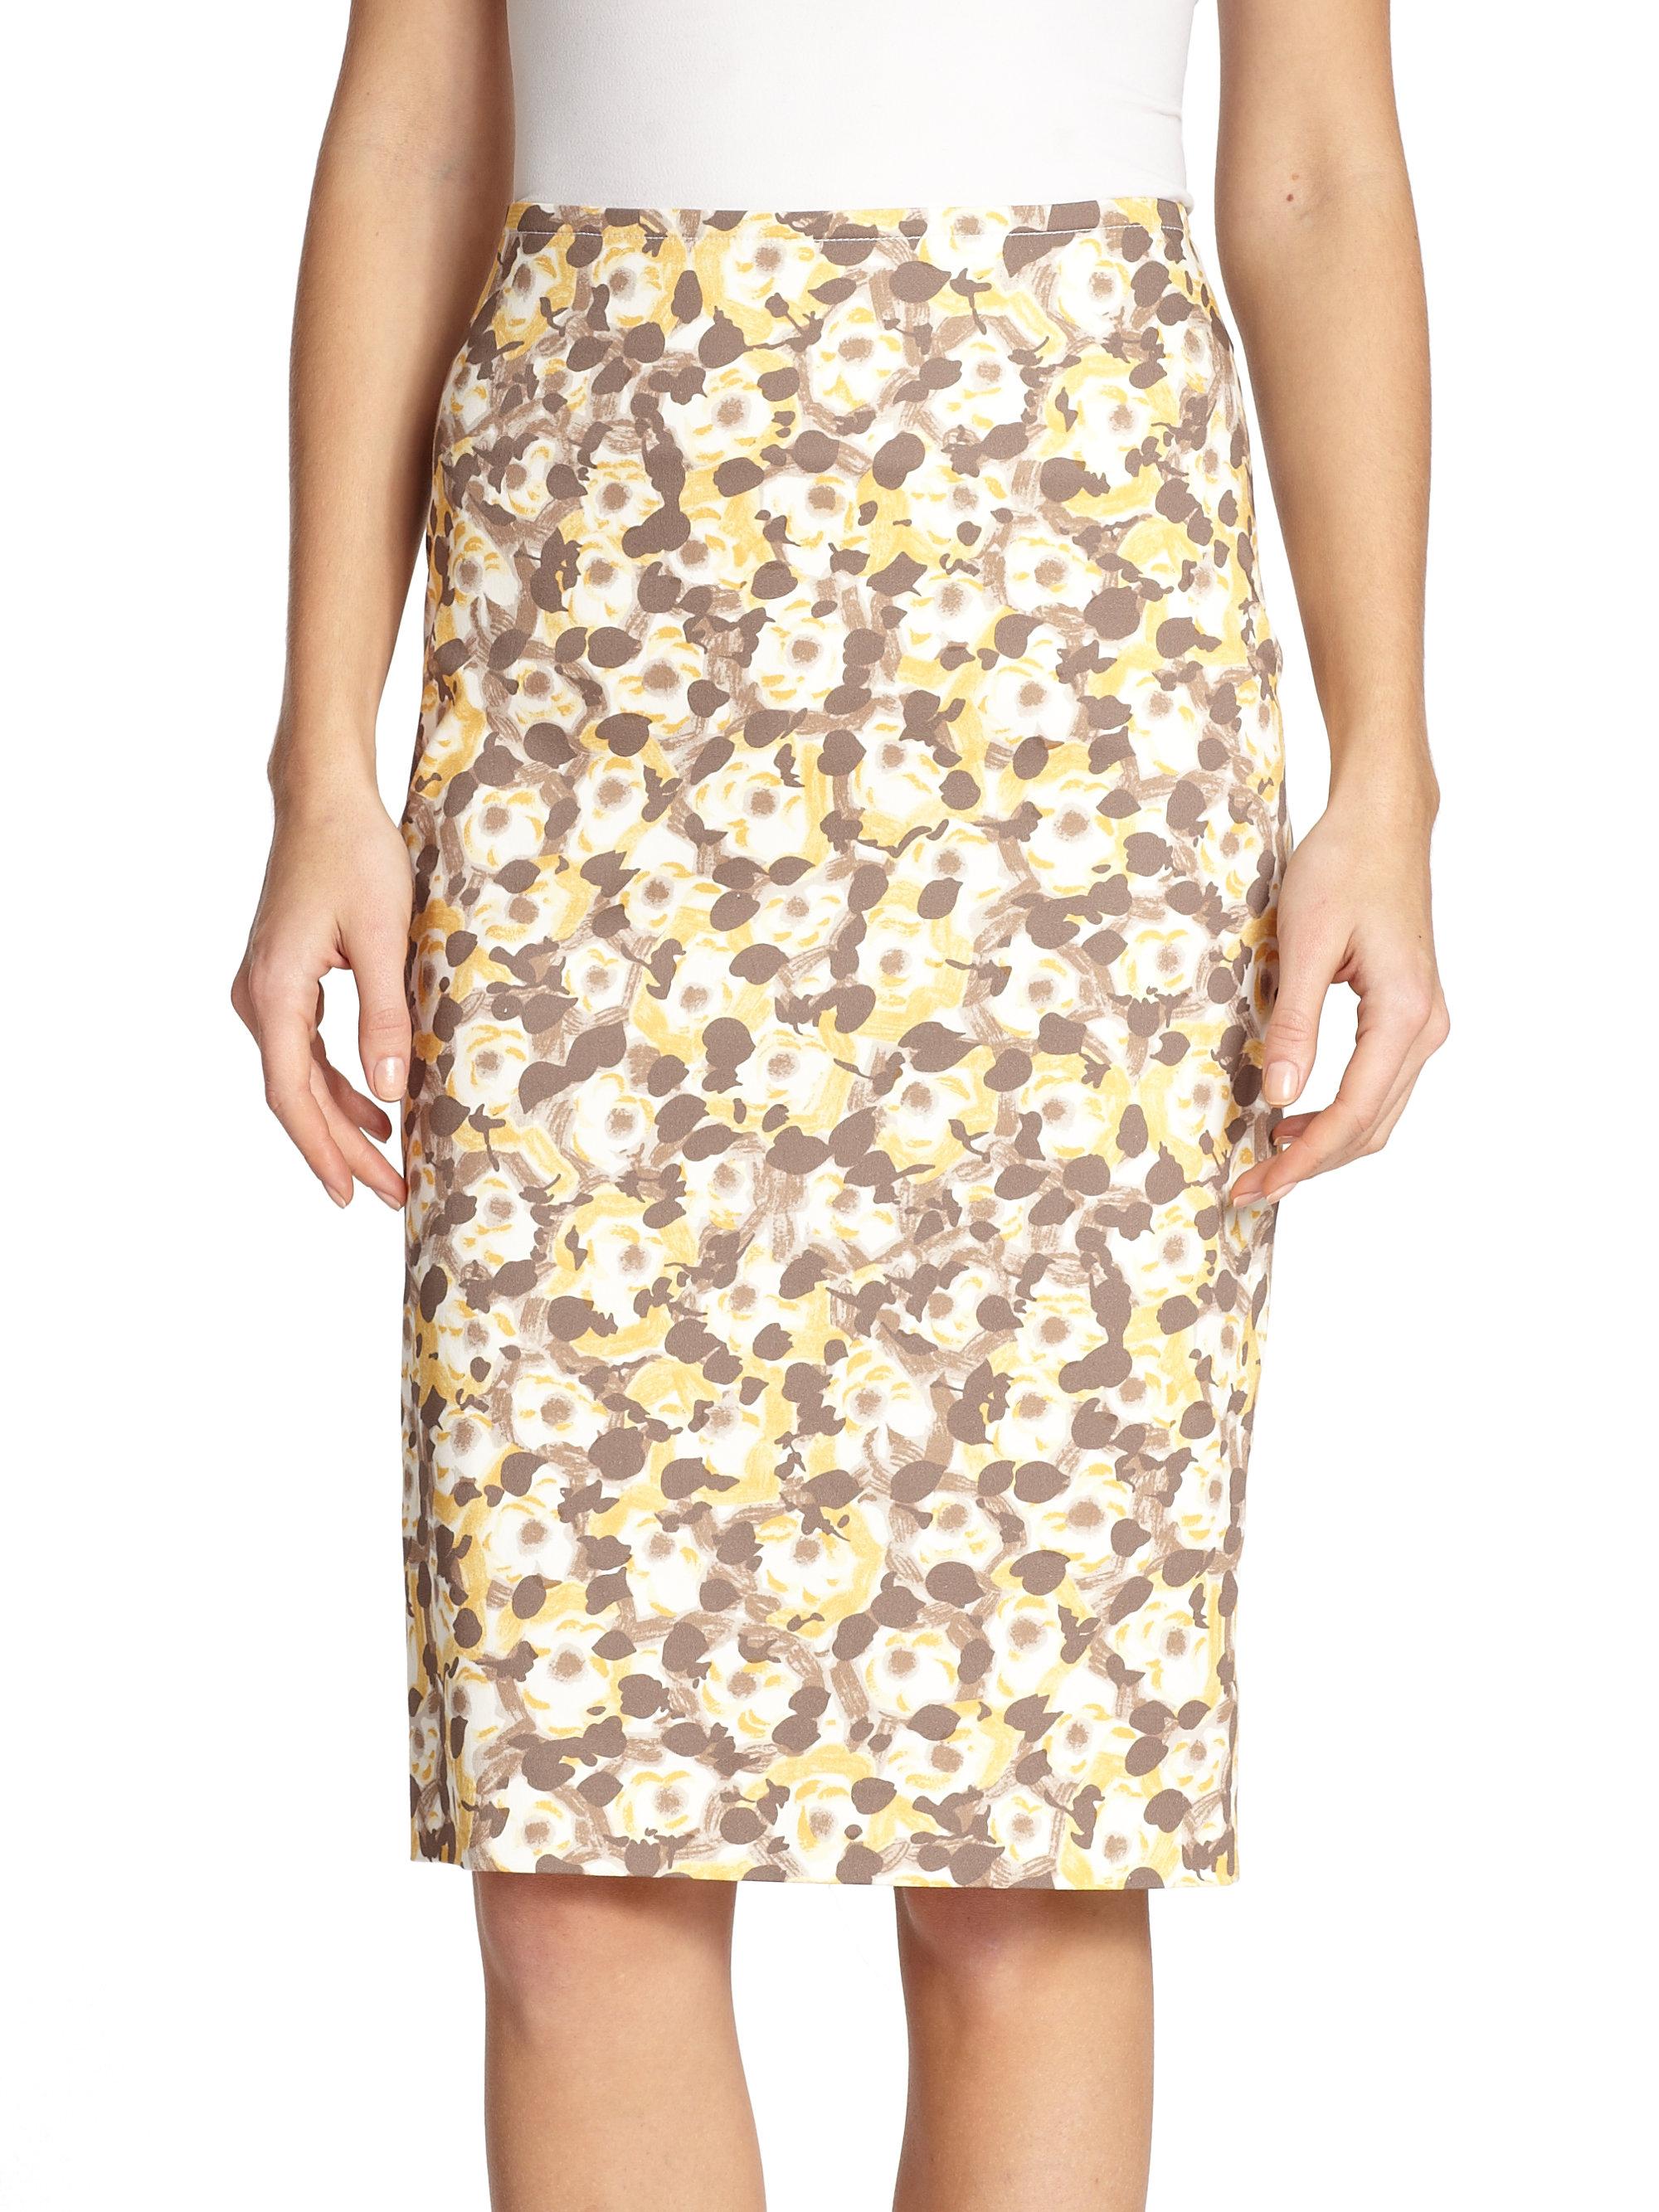 floral pencil skirt - photo #26